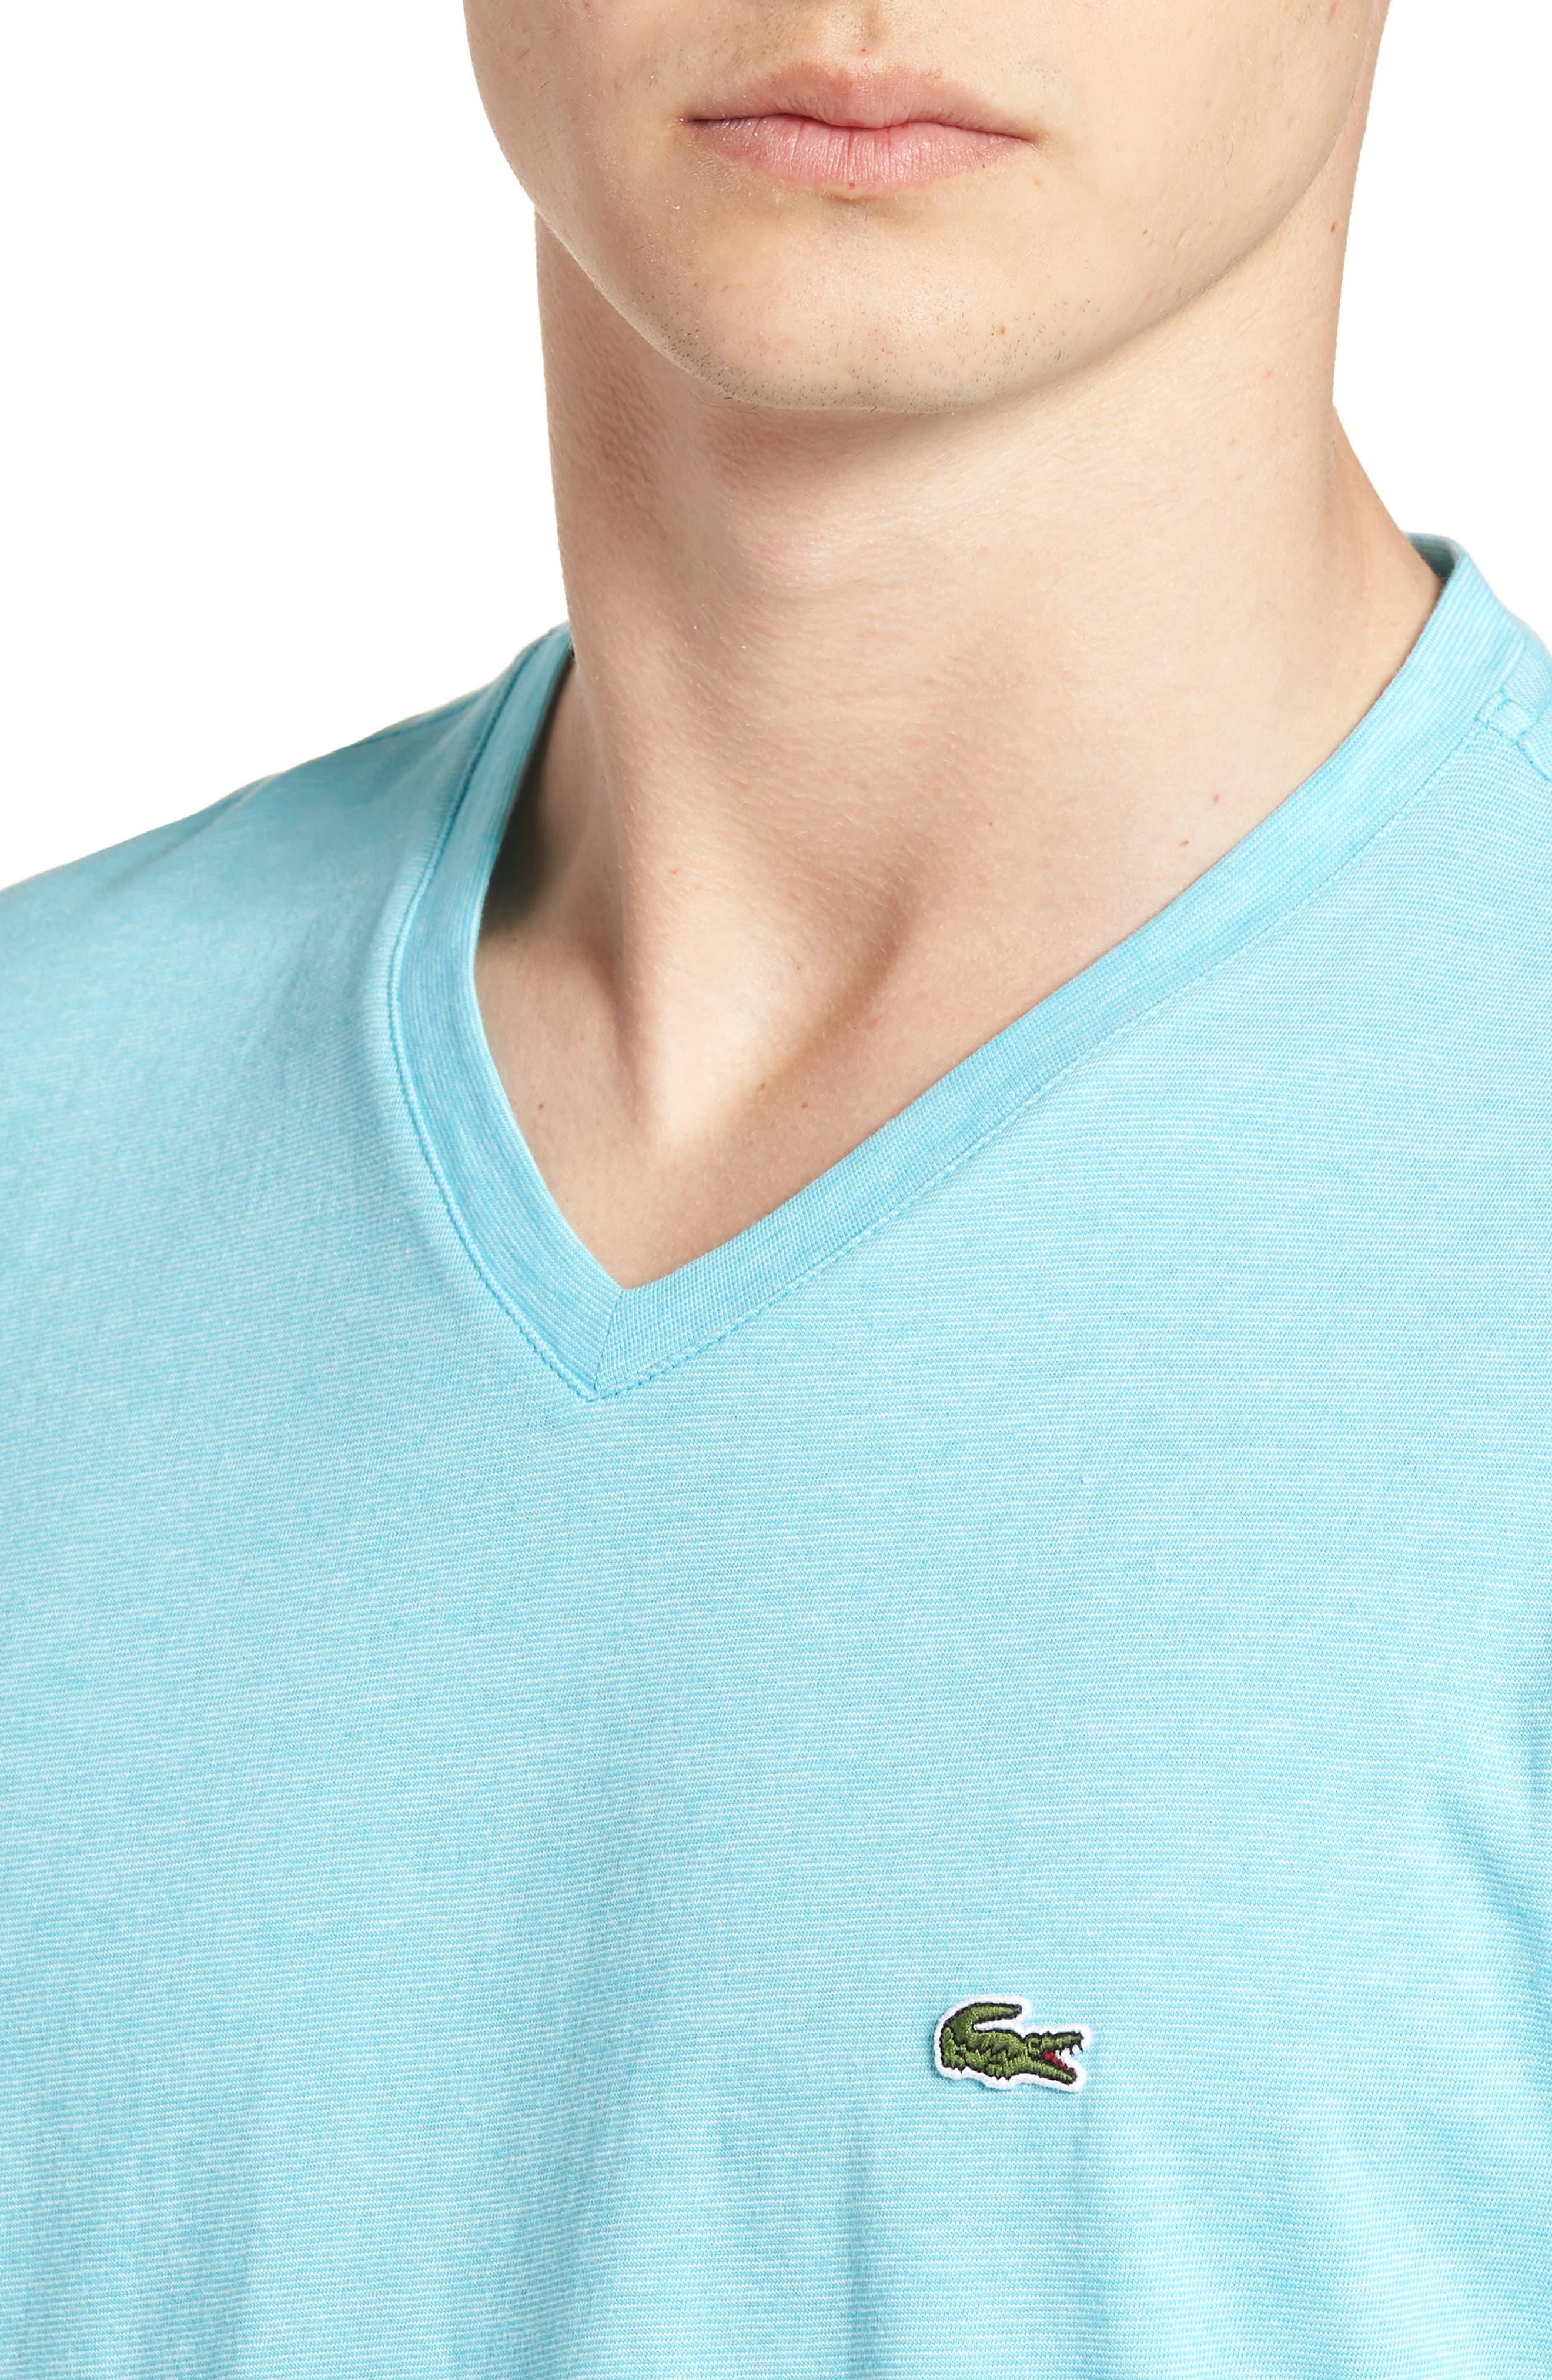 V-Neck Cotton T-Shirt,                             Alternate thumbnail 11, color,